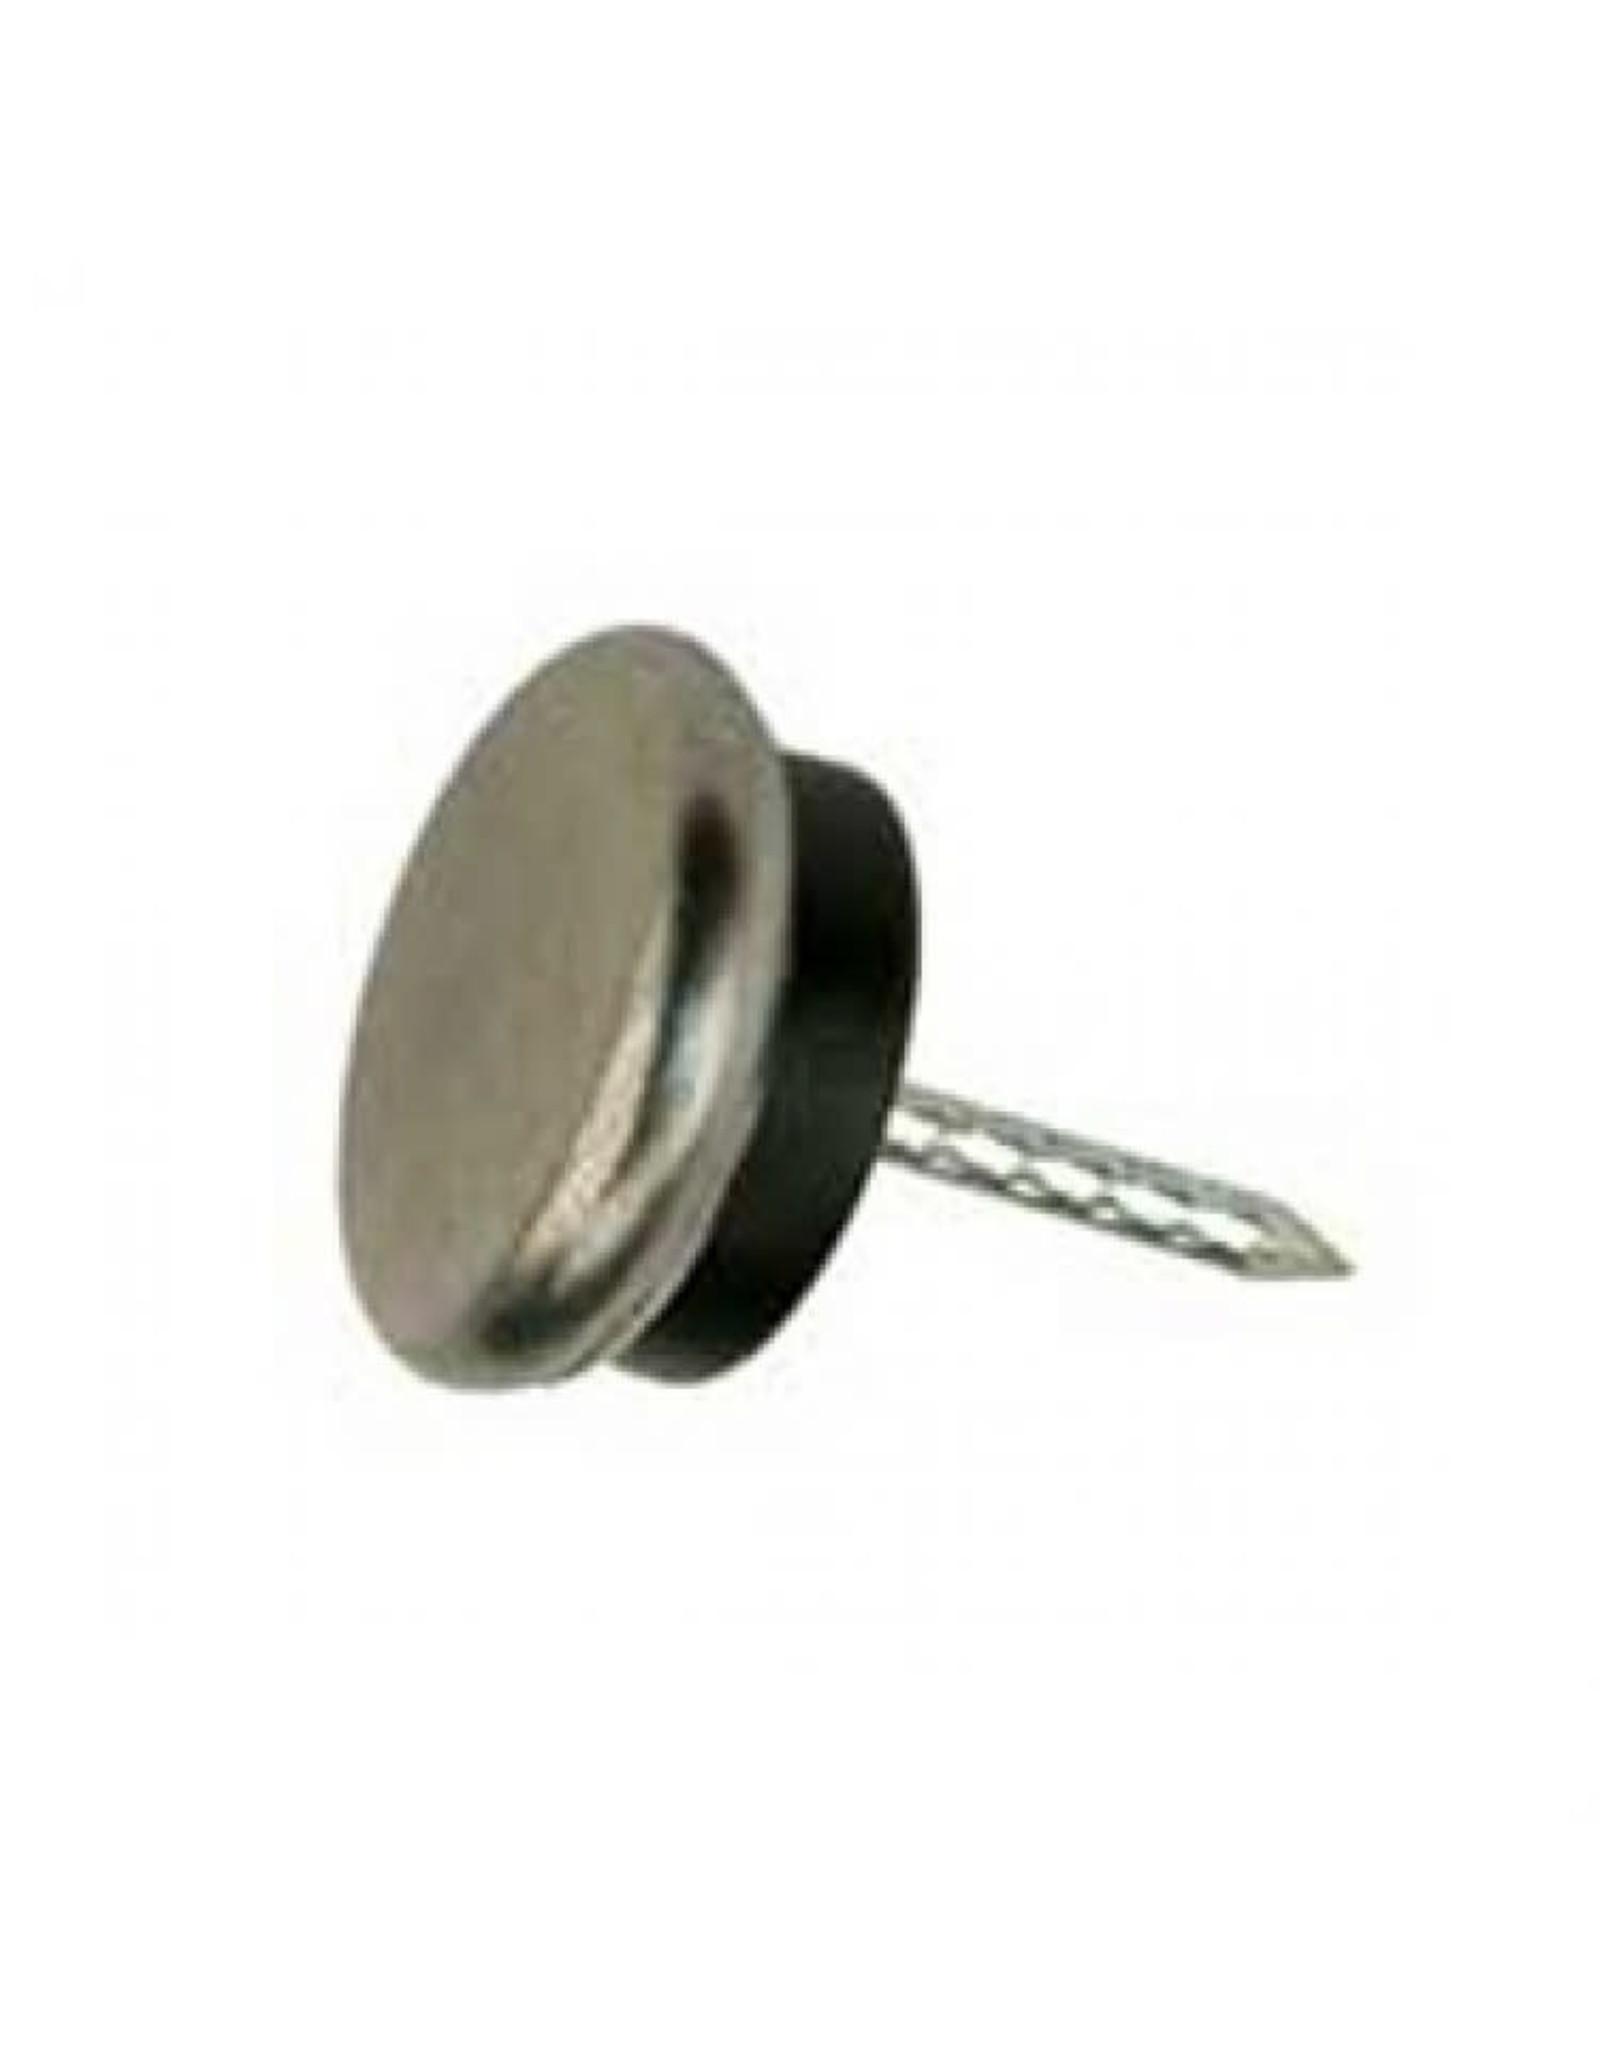 Glijnagel, staal verzinkt rubber buffer 30 mm per 4 stuks